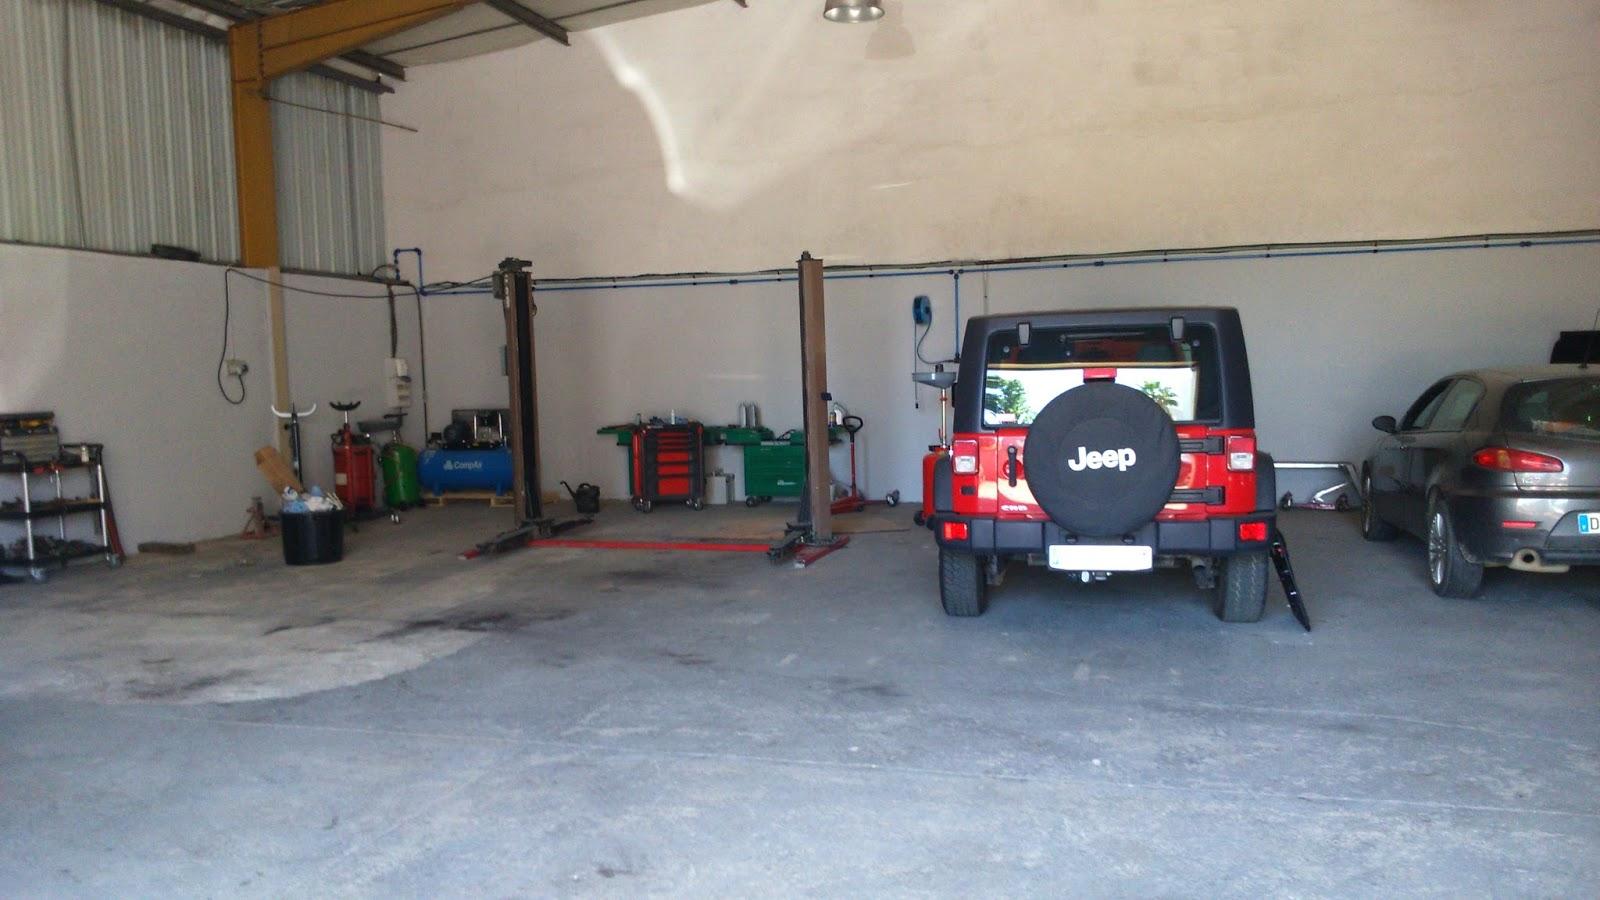 Garage libert ajaccio for Garage bernardini ajaccio